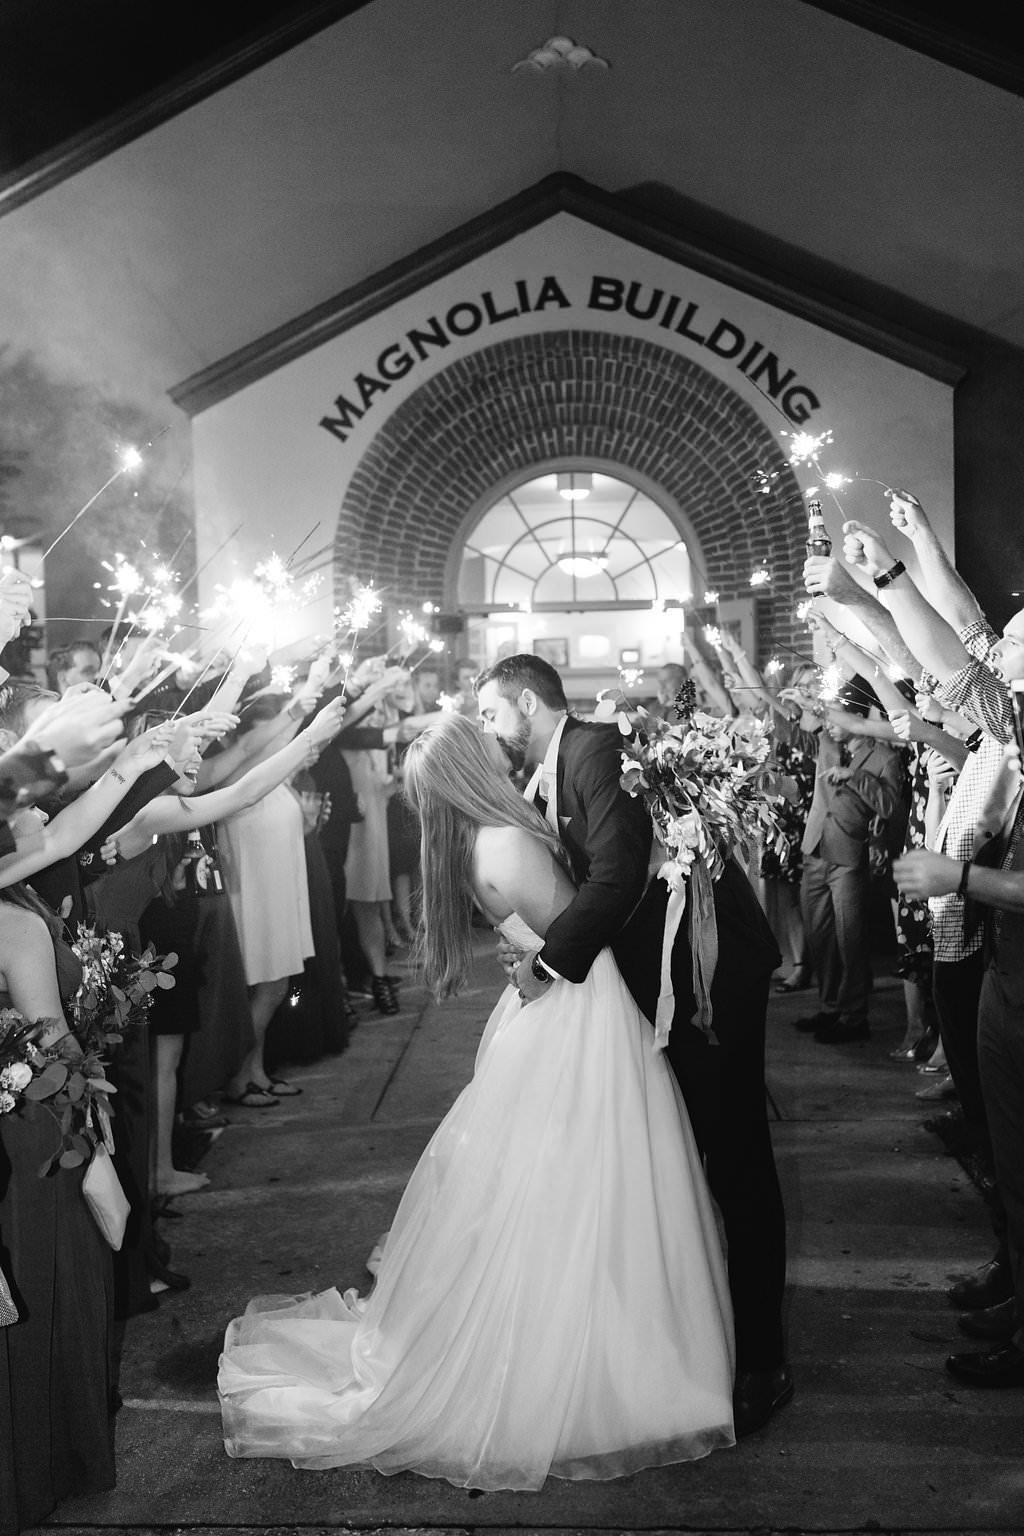 Florida Bride and Groom Black and White Sparkler Exit Wedding Portrait   Lakeland Wedding Venue The Magnolia Building   Tampa Bay Wedding Planner Love Lee Lane